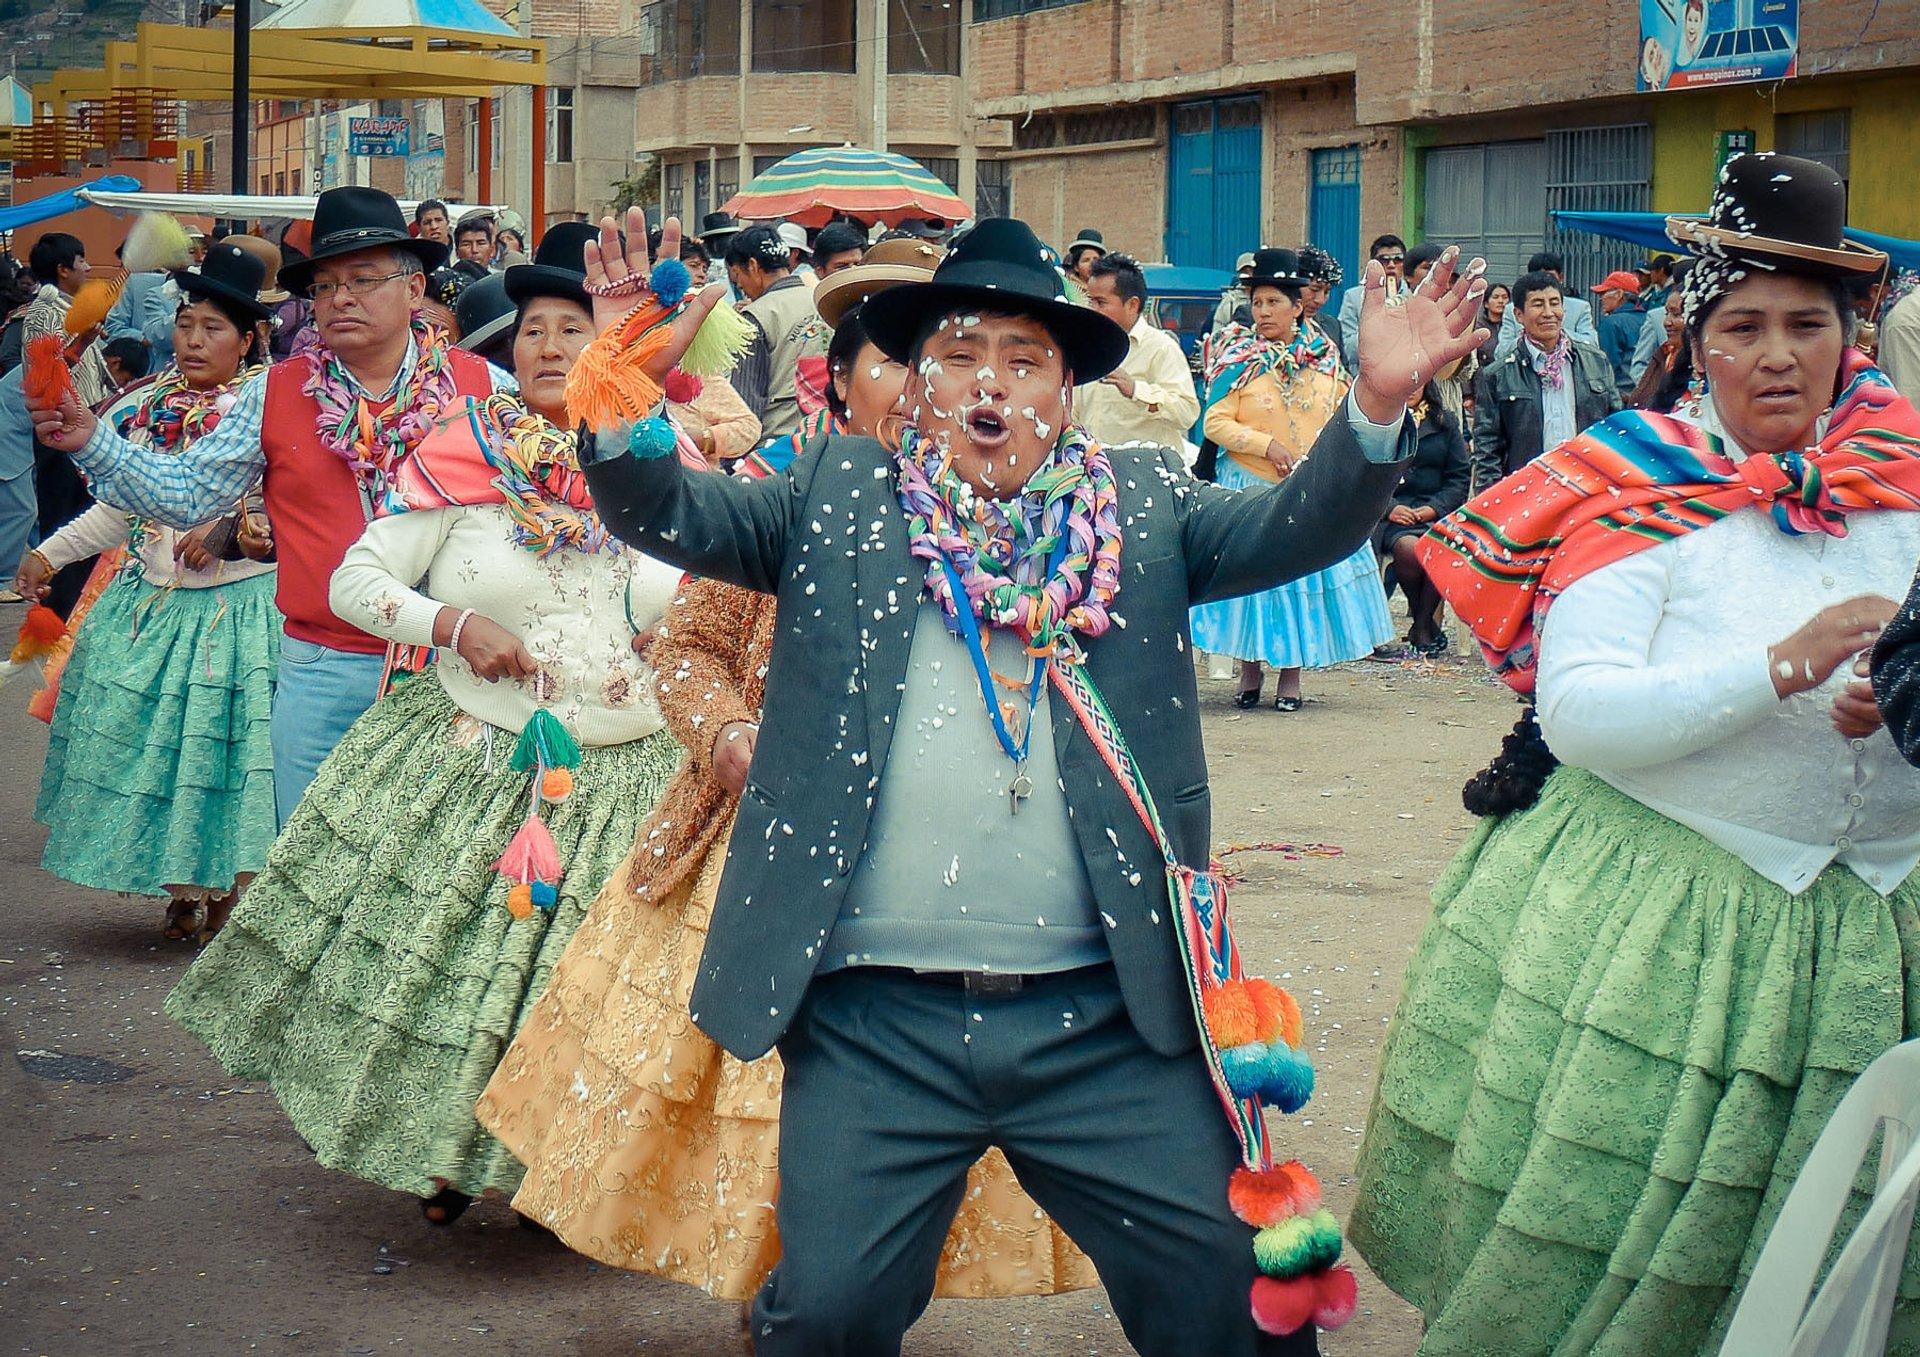 Fiesta de la Virgen de la Candelaria in Peru 2020 - Best Time